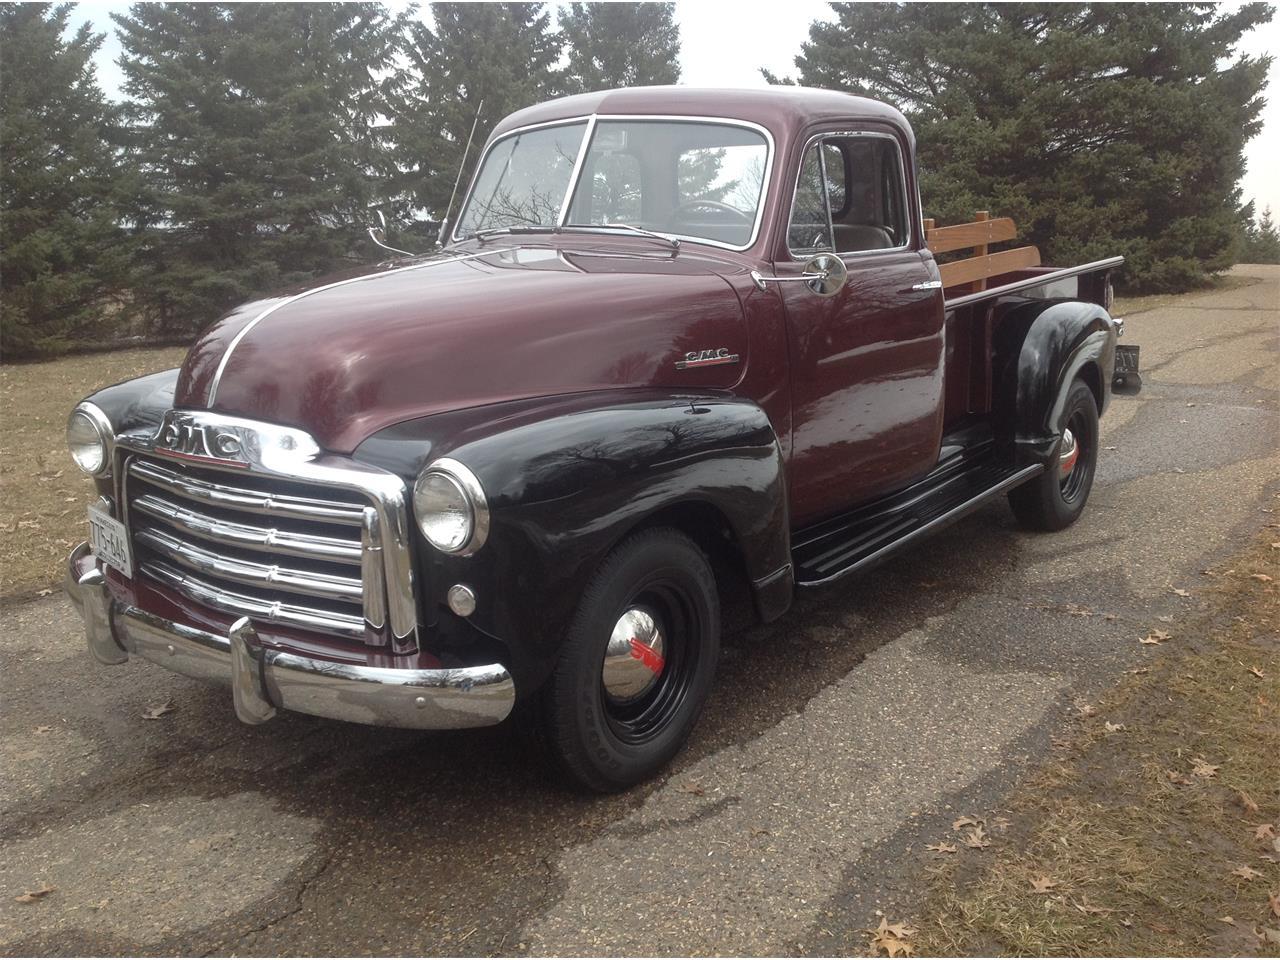 1951 Gmc Pickup For Sale Classiccars Com Cc 1201686